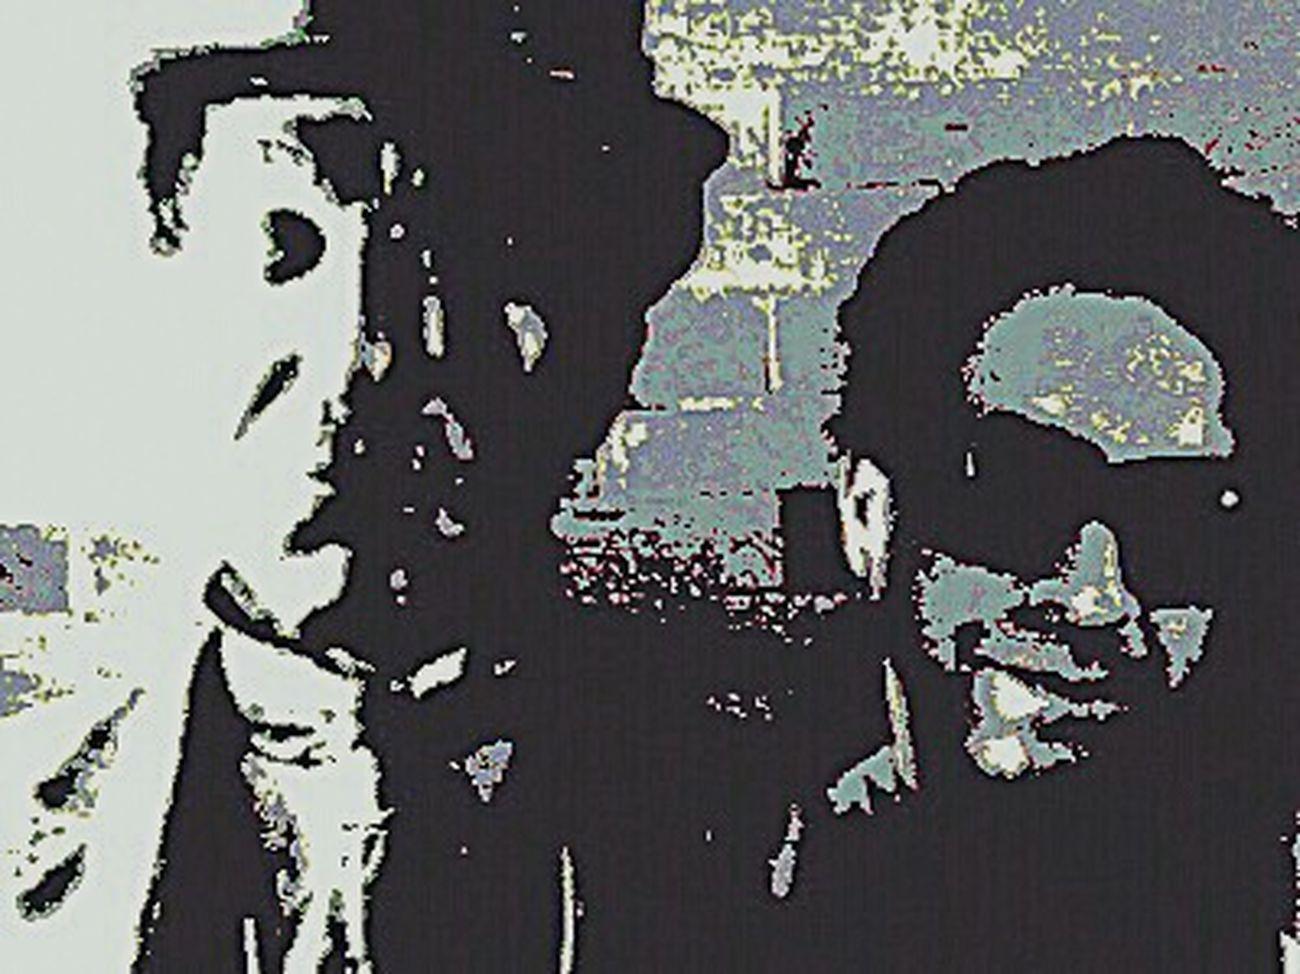 Charliechaplin Charlie Chaplin n Me! Thats Me ♥ Thats Me! Selfie ✌ I'm HOT Chillin Kickin It Laidback